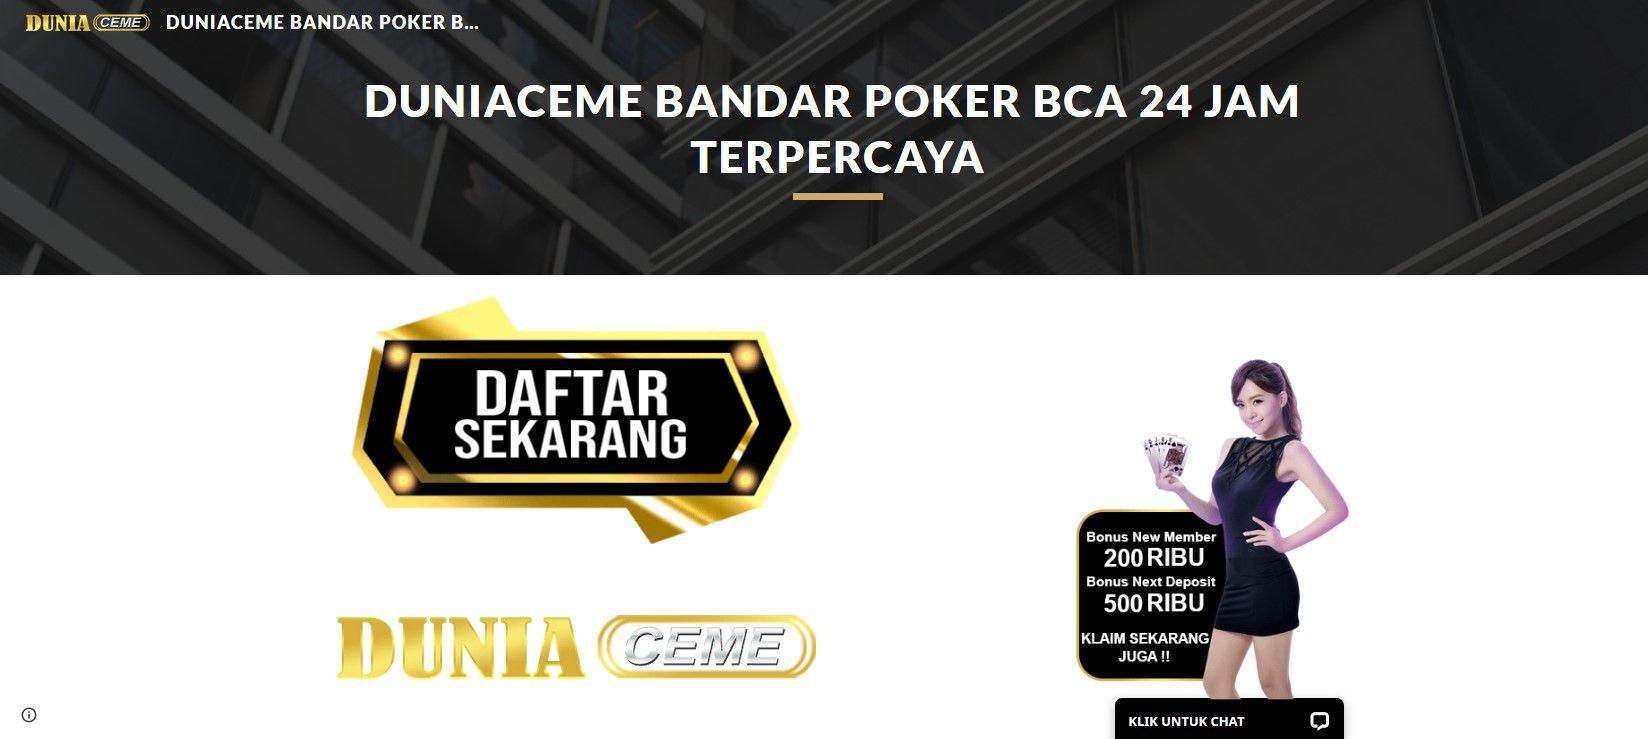 Pin On Bandar Poker Bca 24 Jam Terpercaya